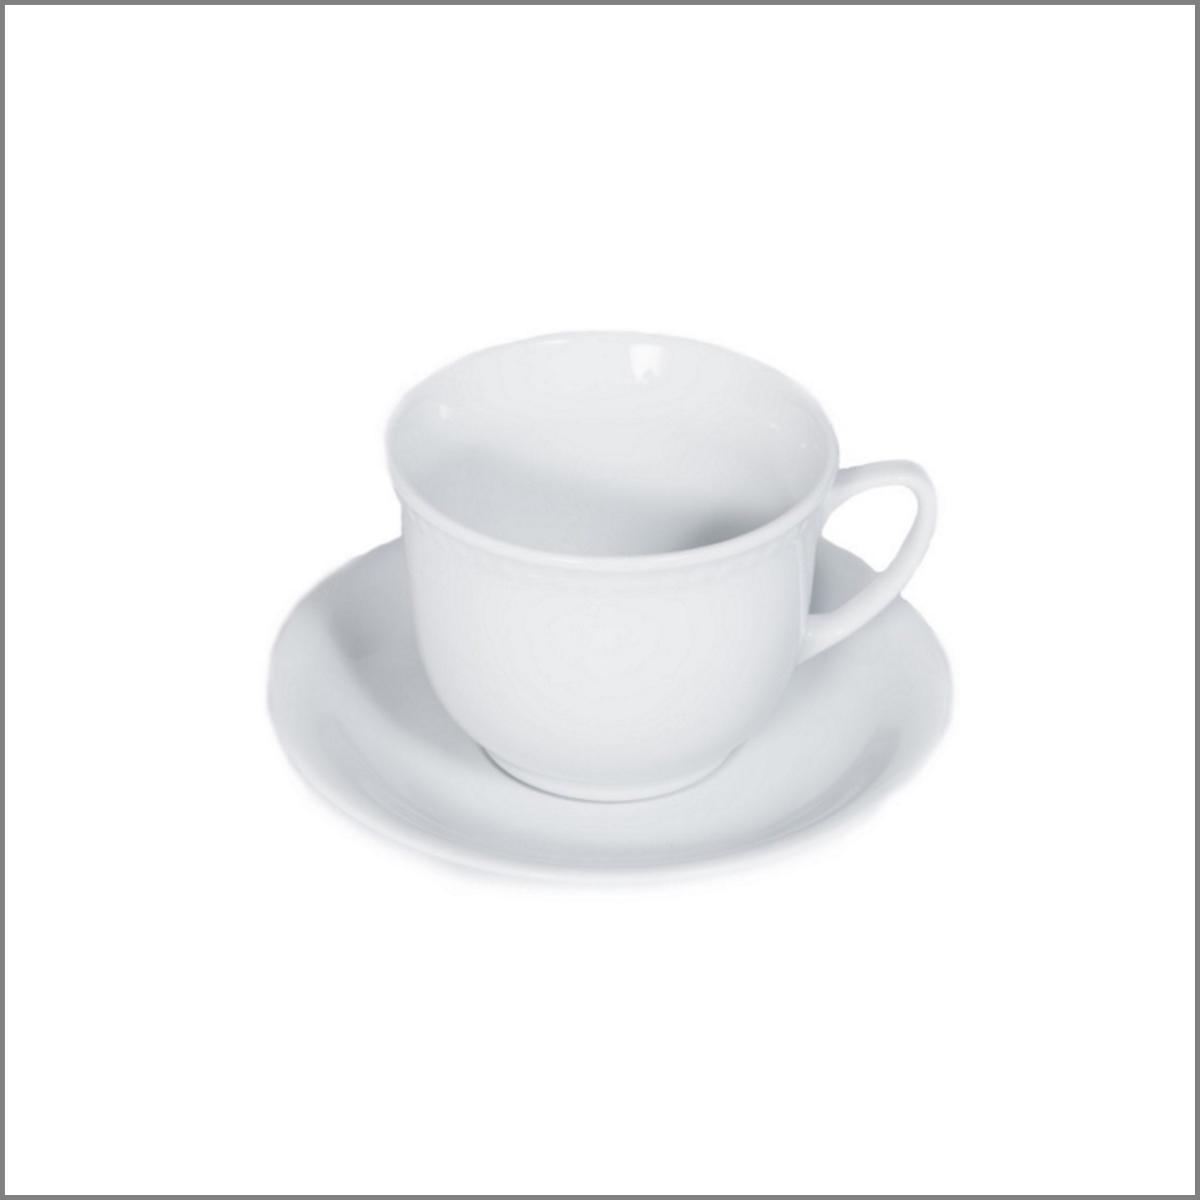 Tasse a the petit dejeuner 1